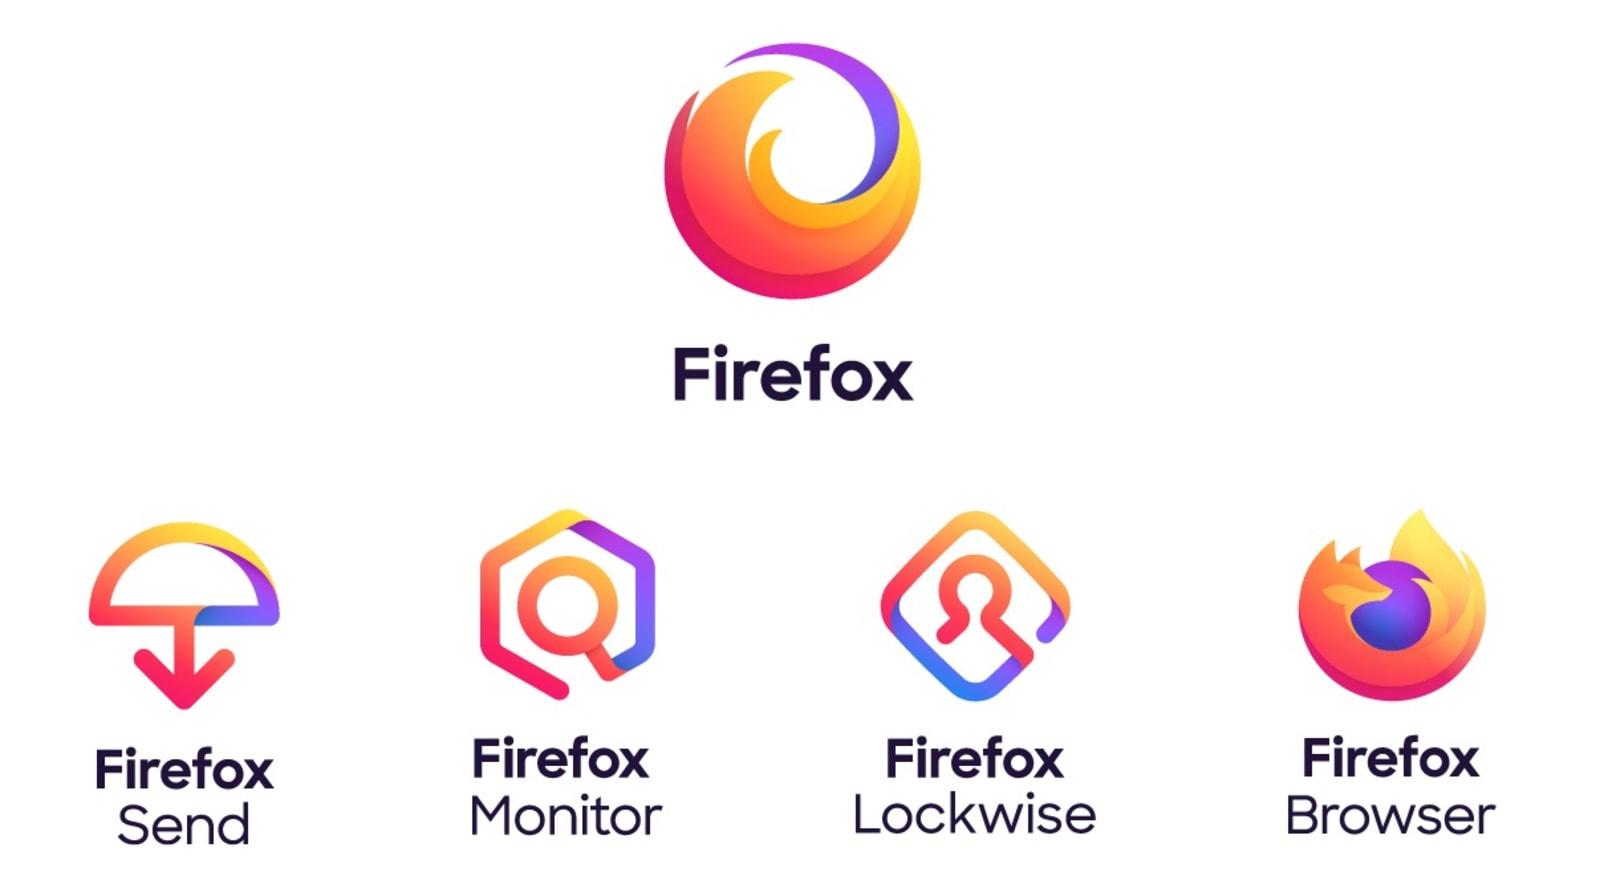 Firefox logo family